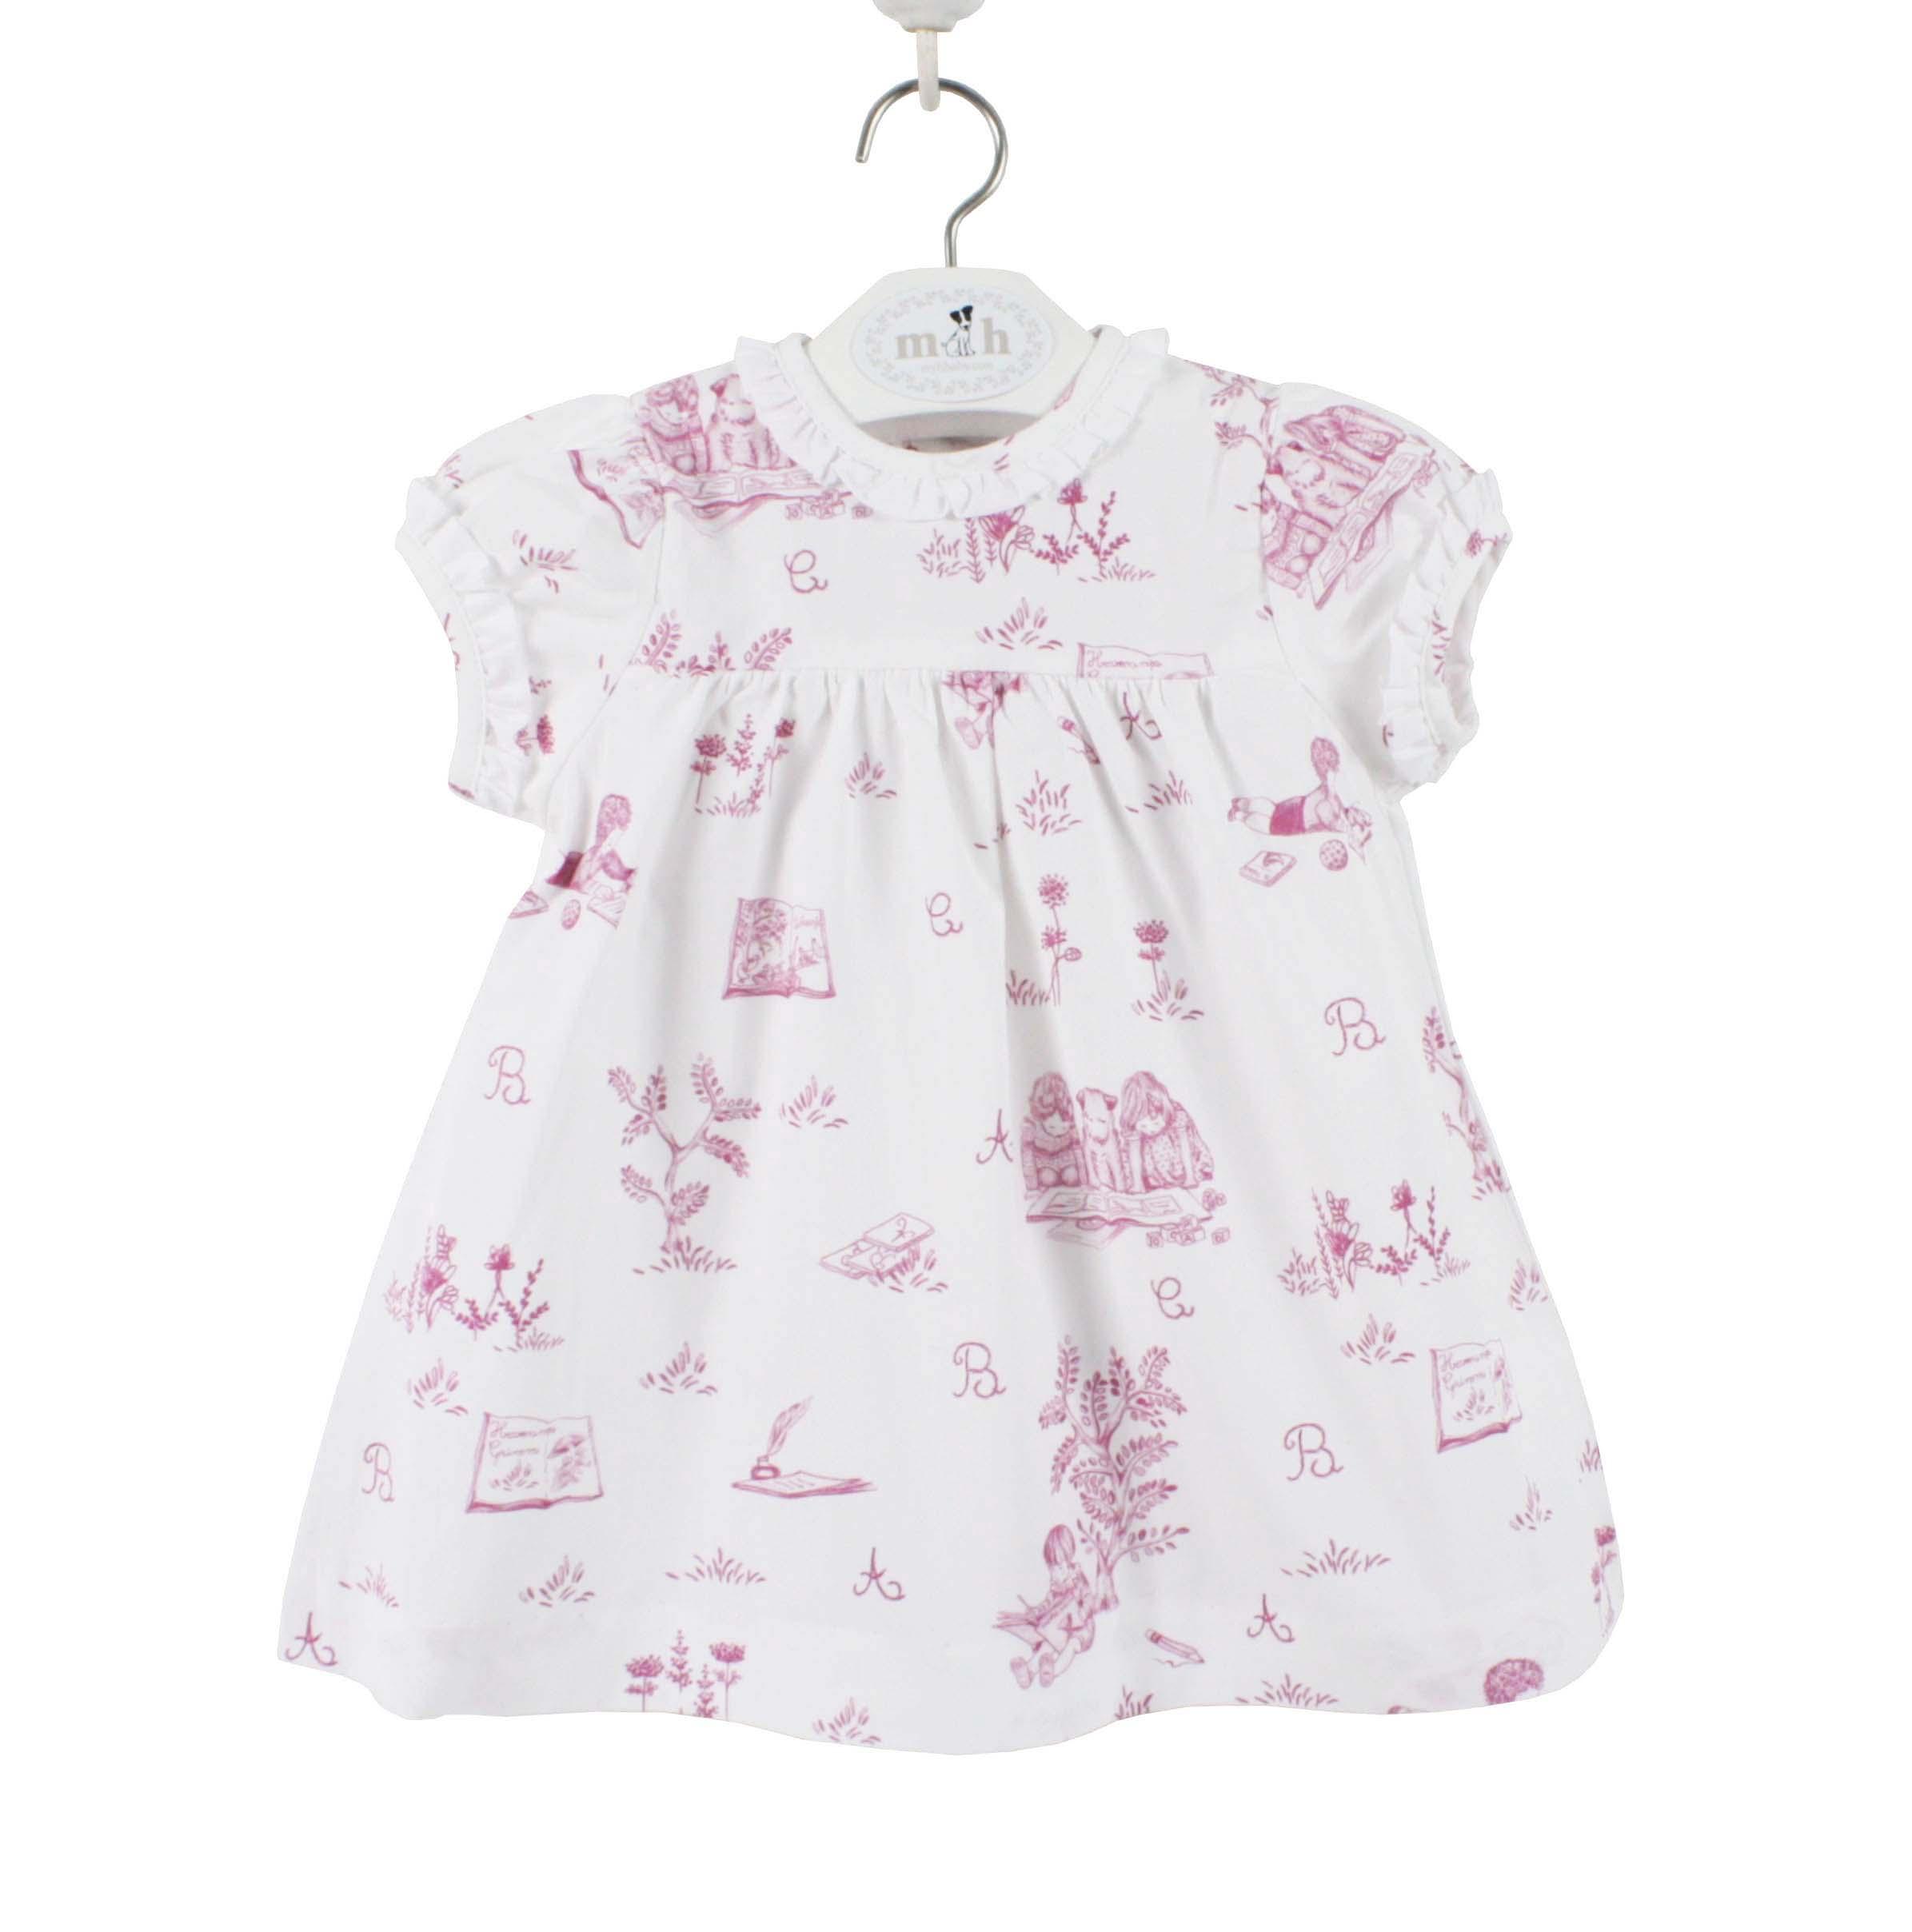 Girls' Clothing (0-24 Months) Girls Pink Short Dungarees 6-9months.